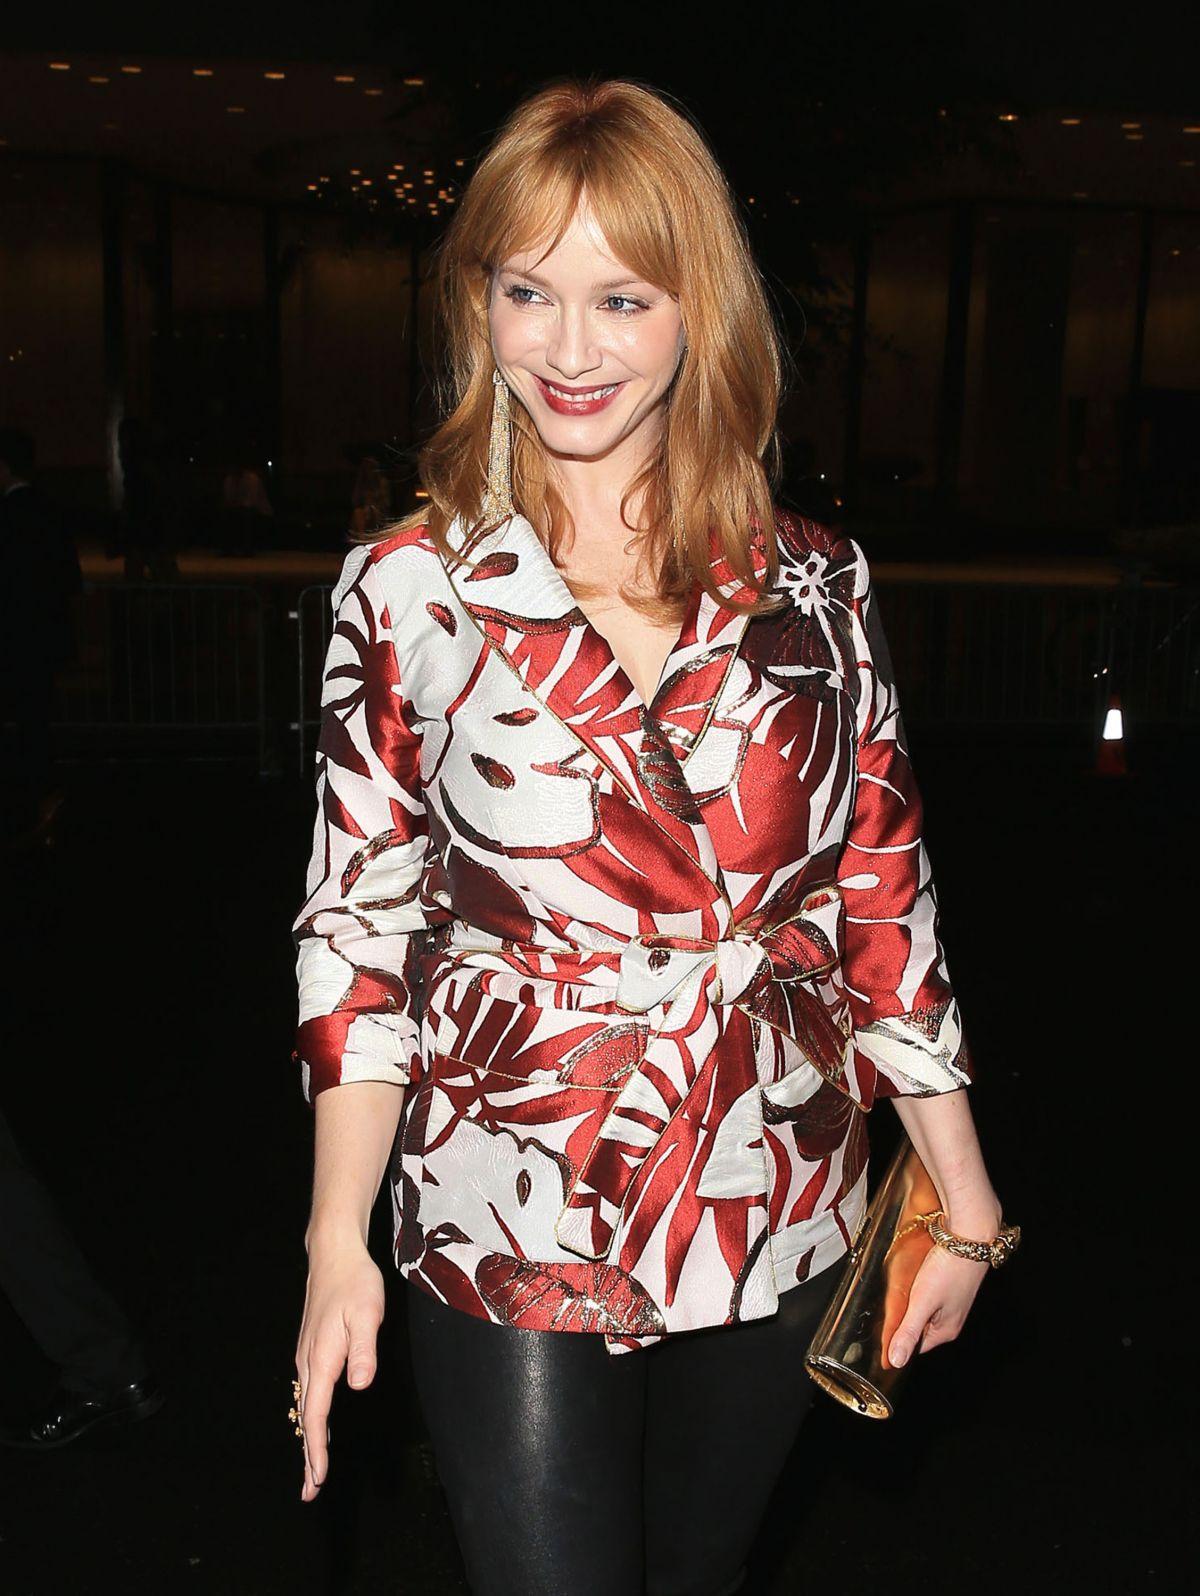 HQ Photos of Christina Hendricks At Harper's Bazaar Celebrates Icons By Carine Roitfeld In New York City